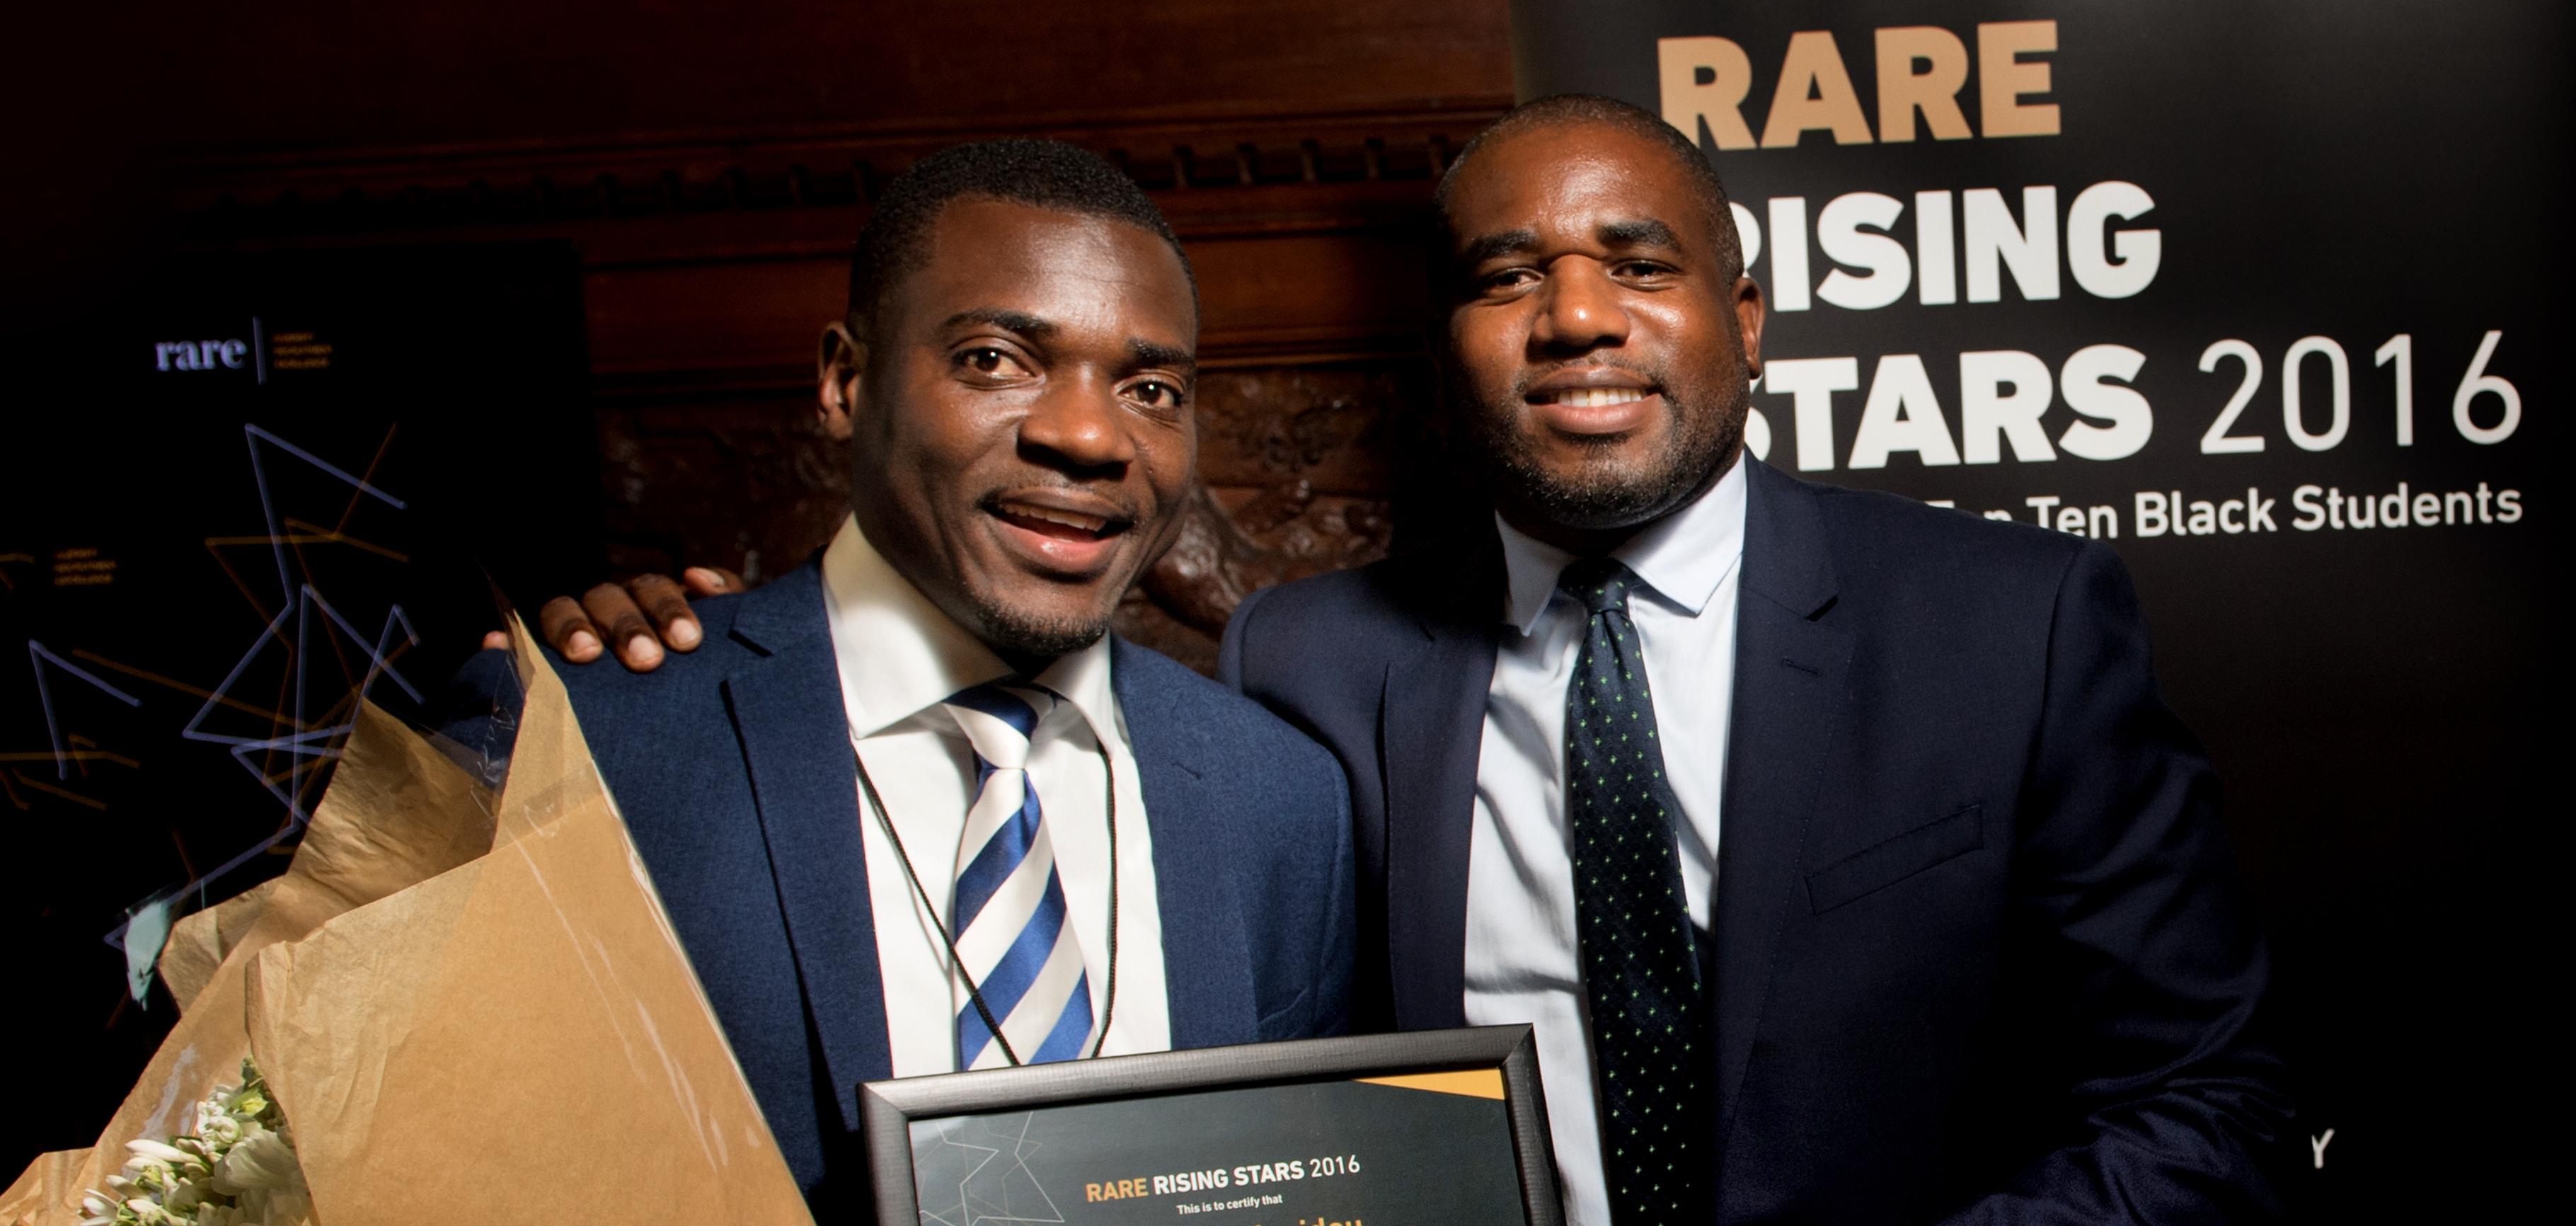 Oxford postgraduate named 'Britain's top black student'